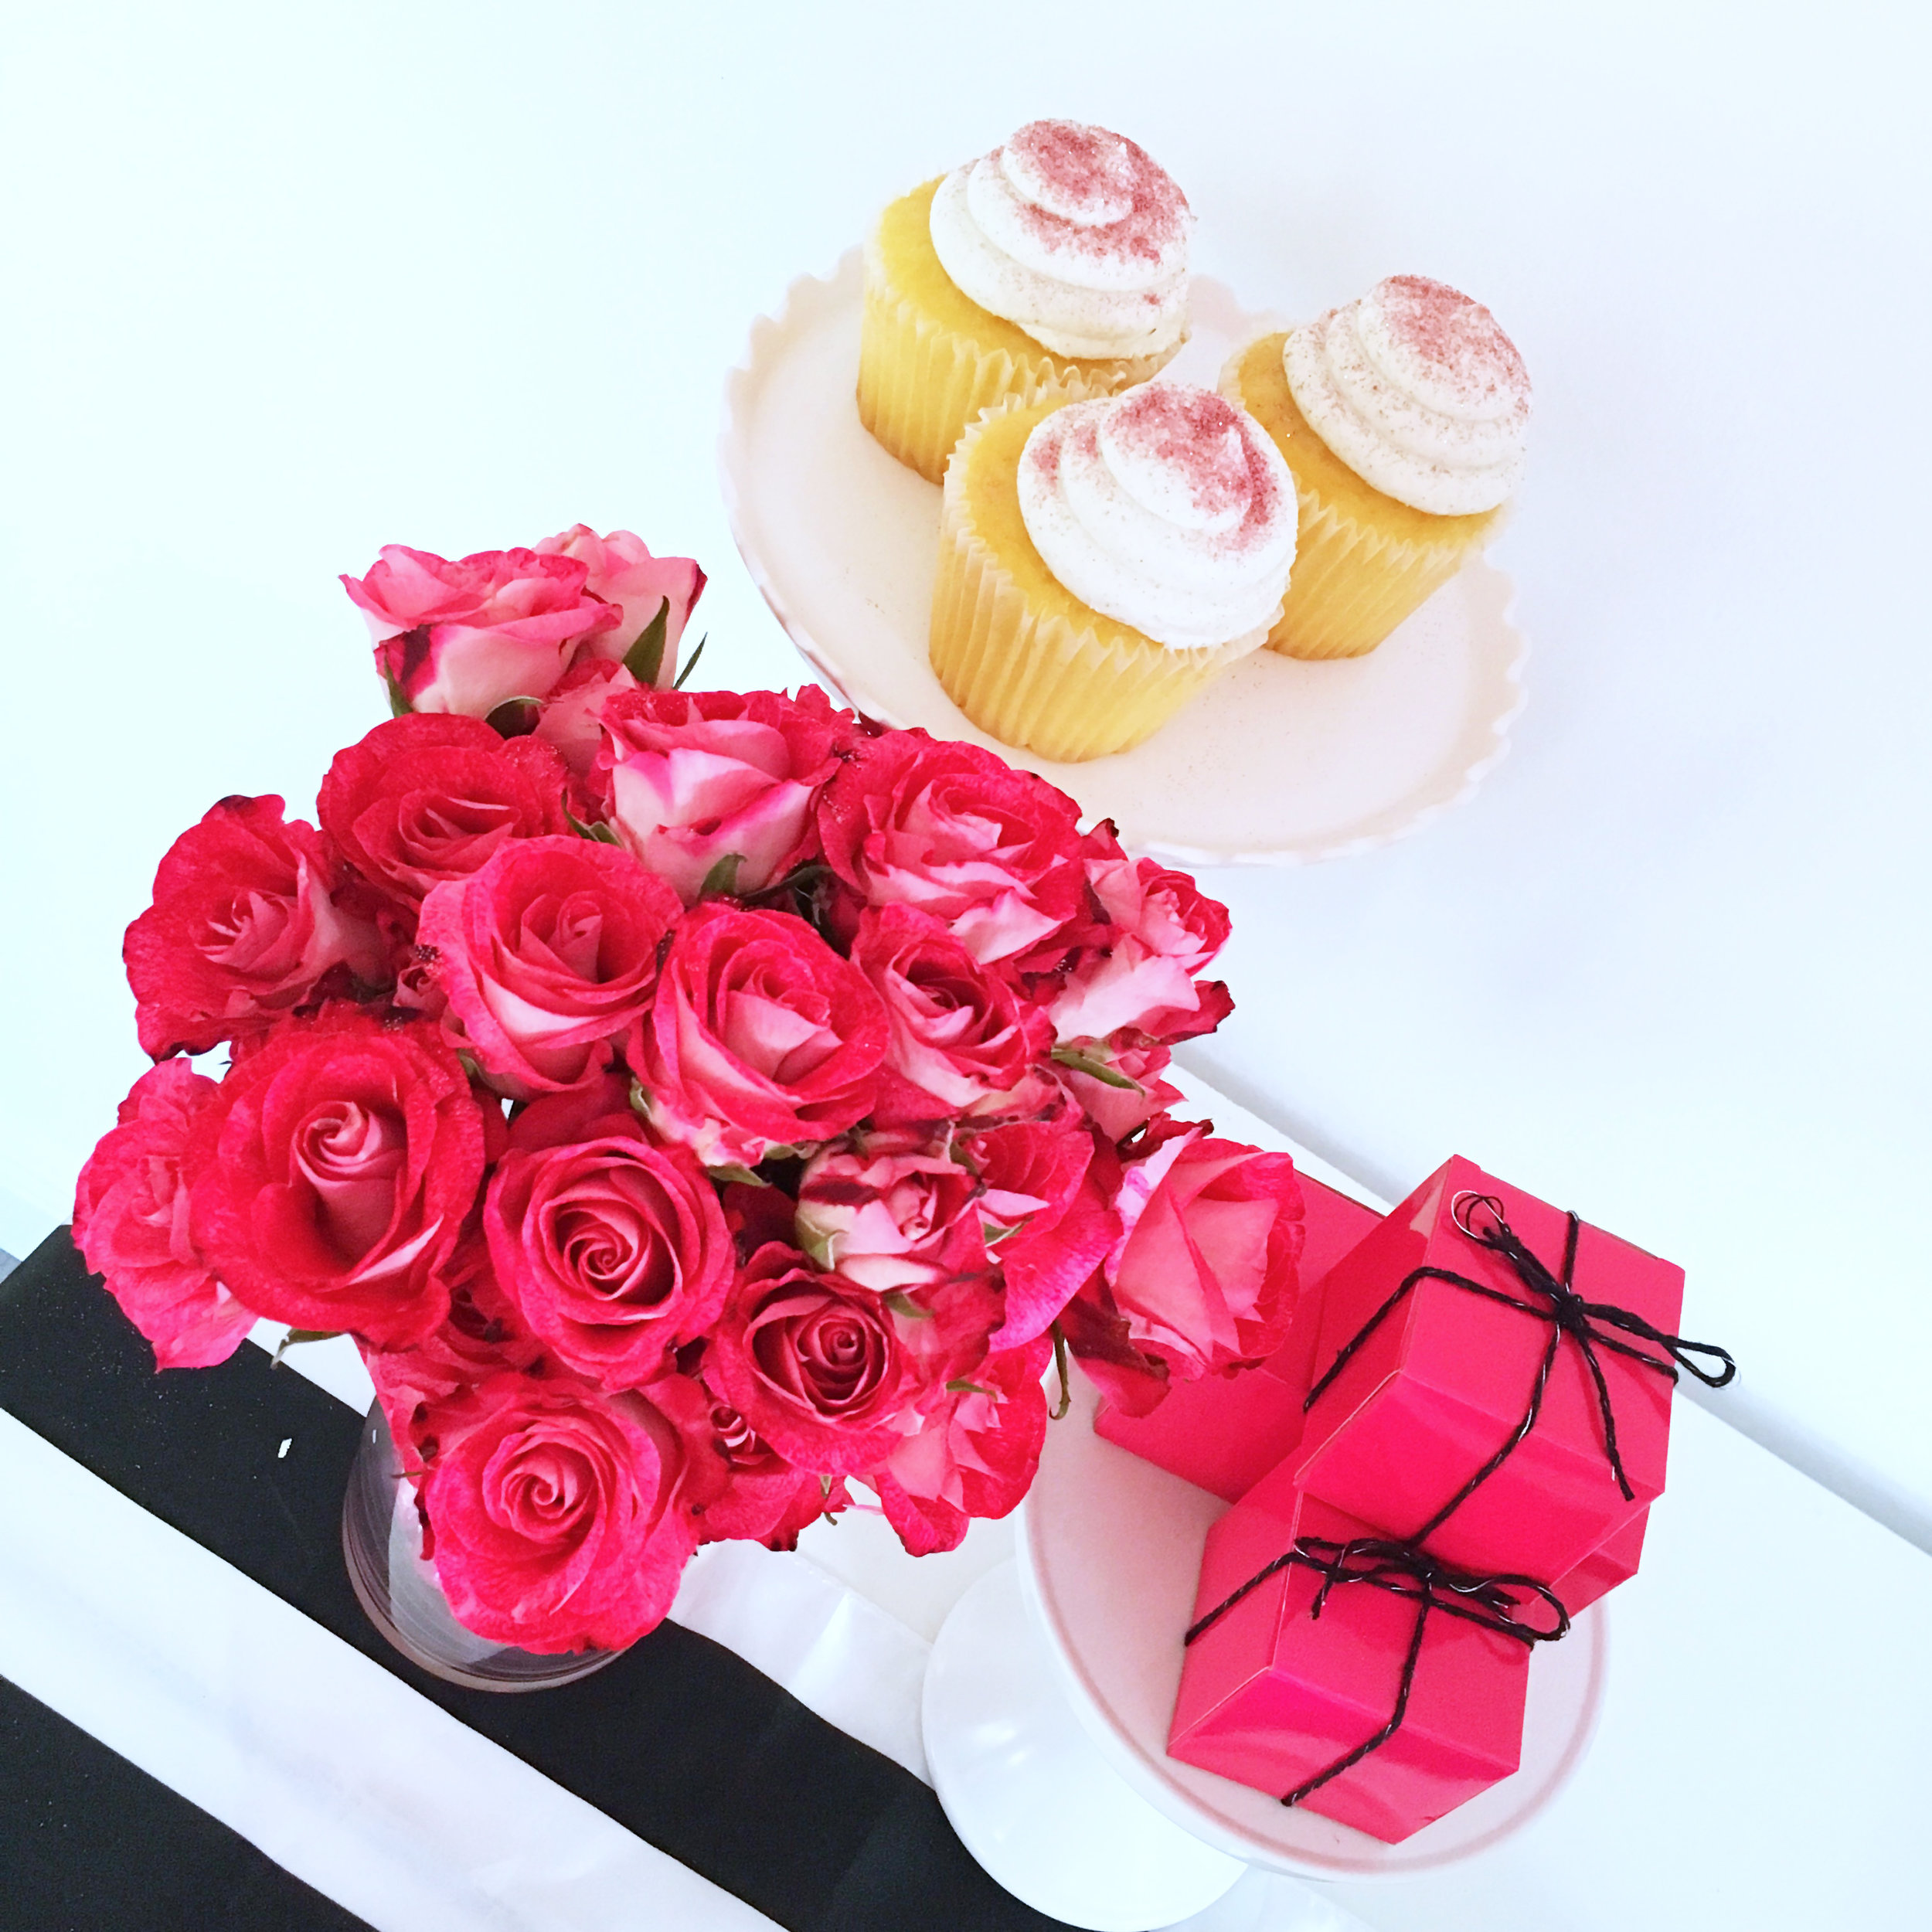 Cupcakesandflowers